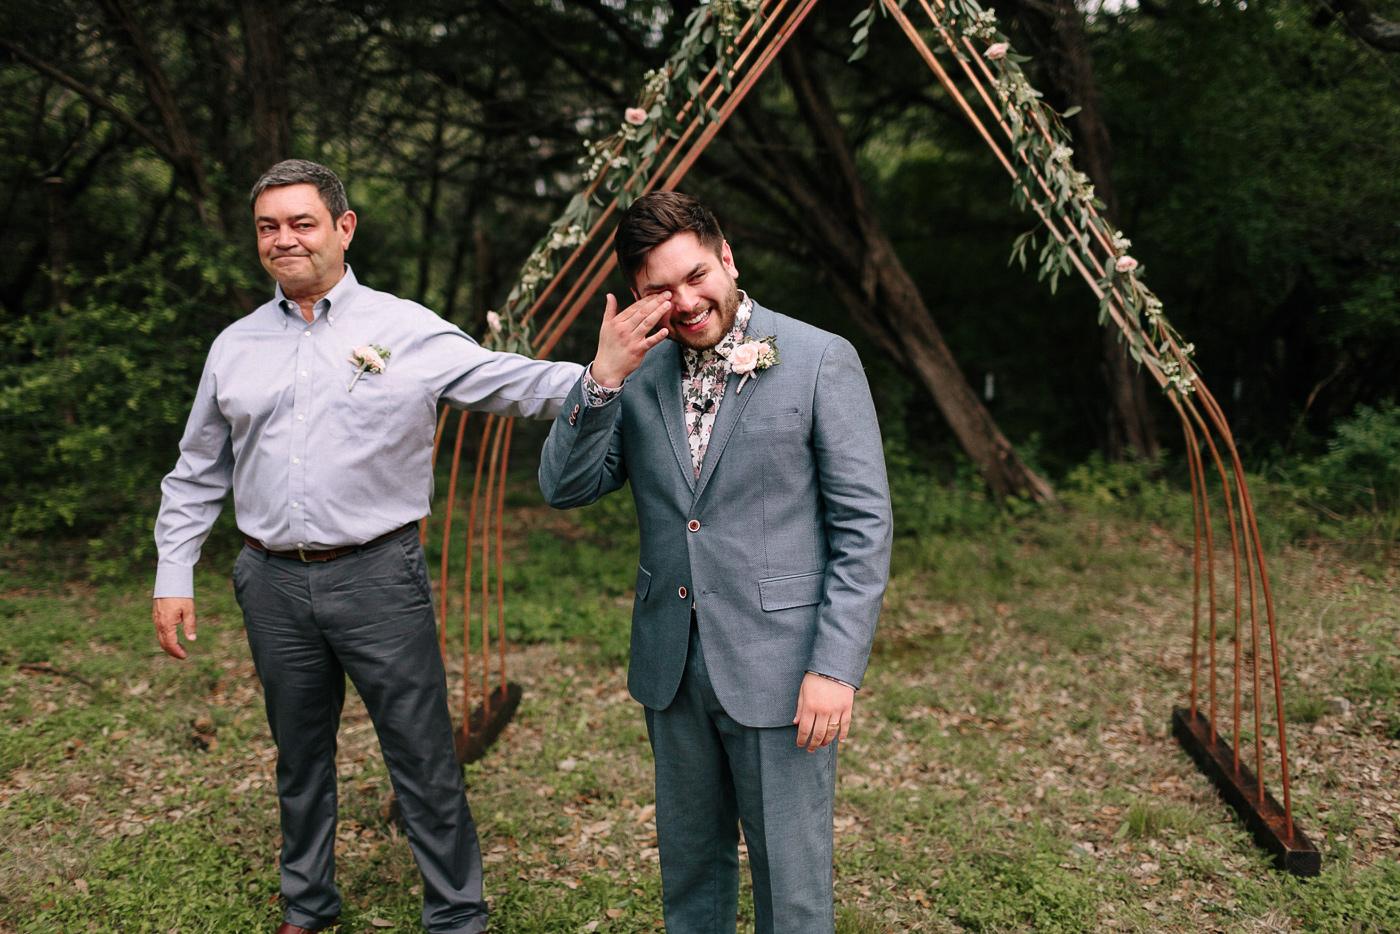 Texas Backyard Wedding Groom and Father Emotional Moment